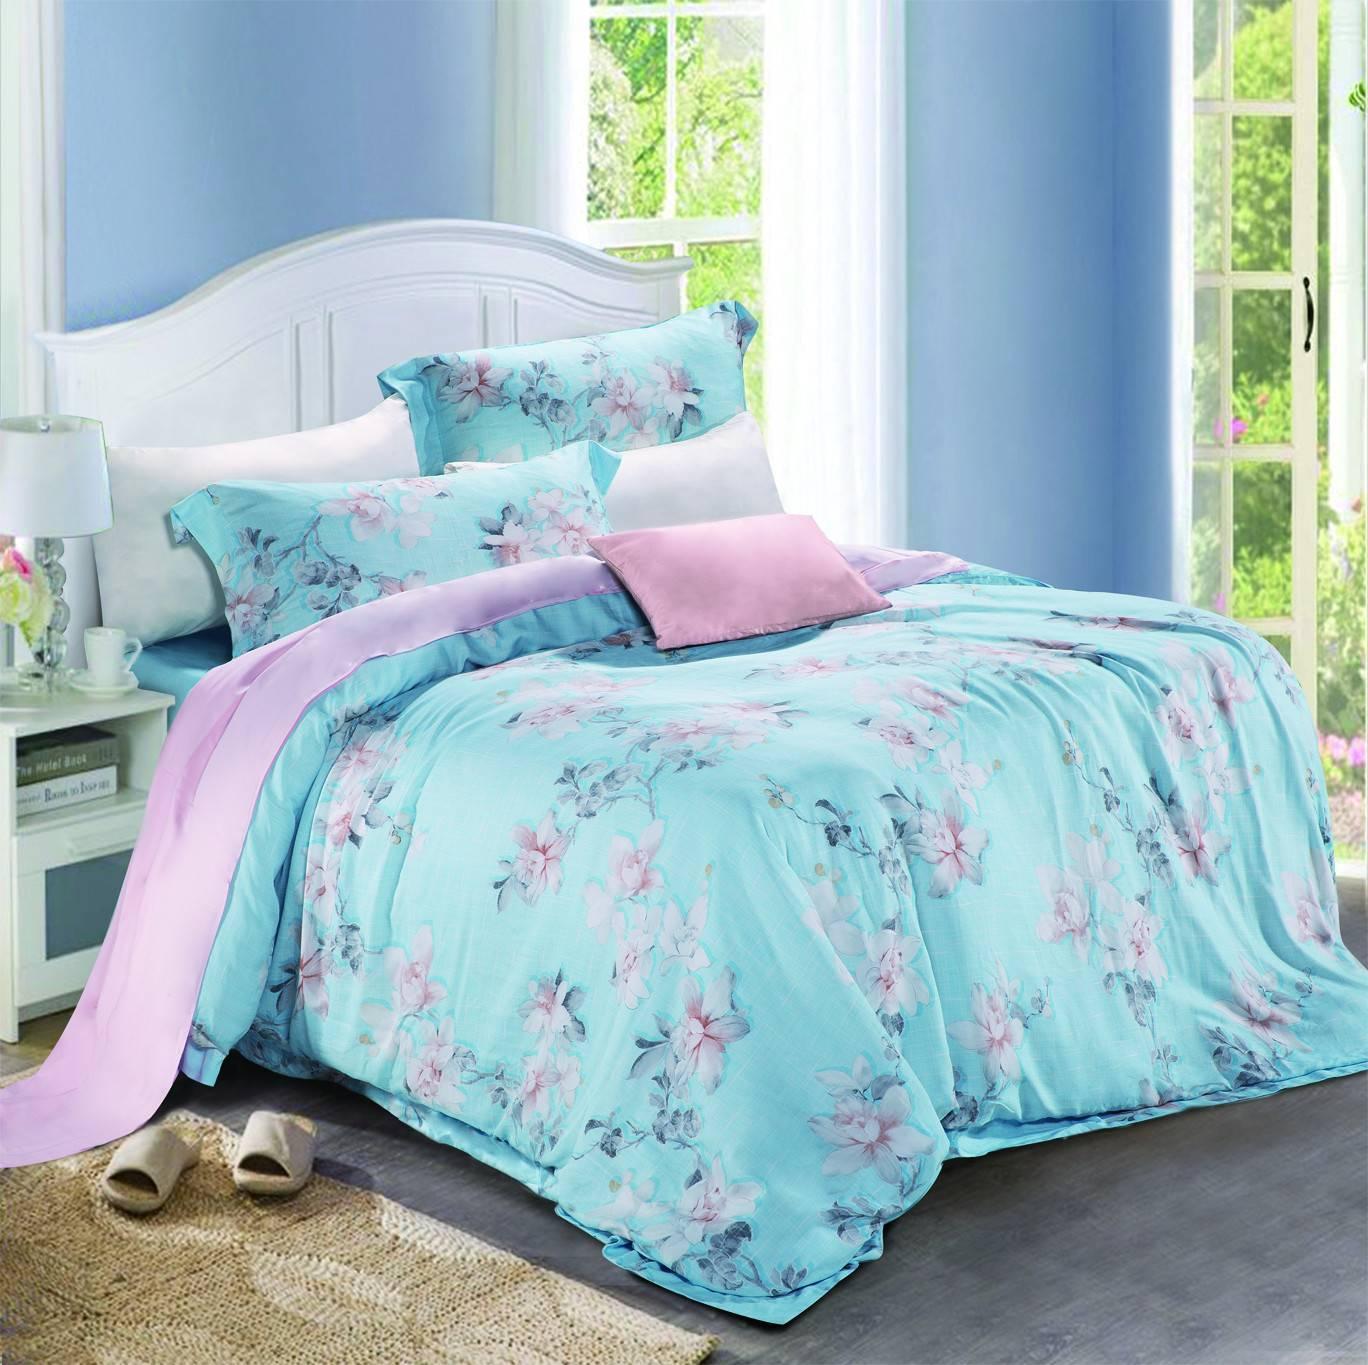 45% Cotton 45% Lyocell 10% Linen Floral Prints Bed Sheet Set   #6846